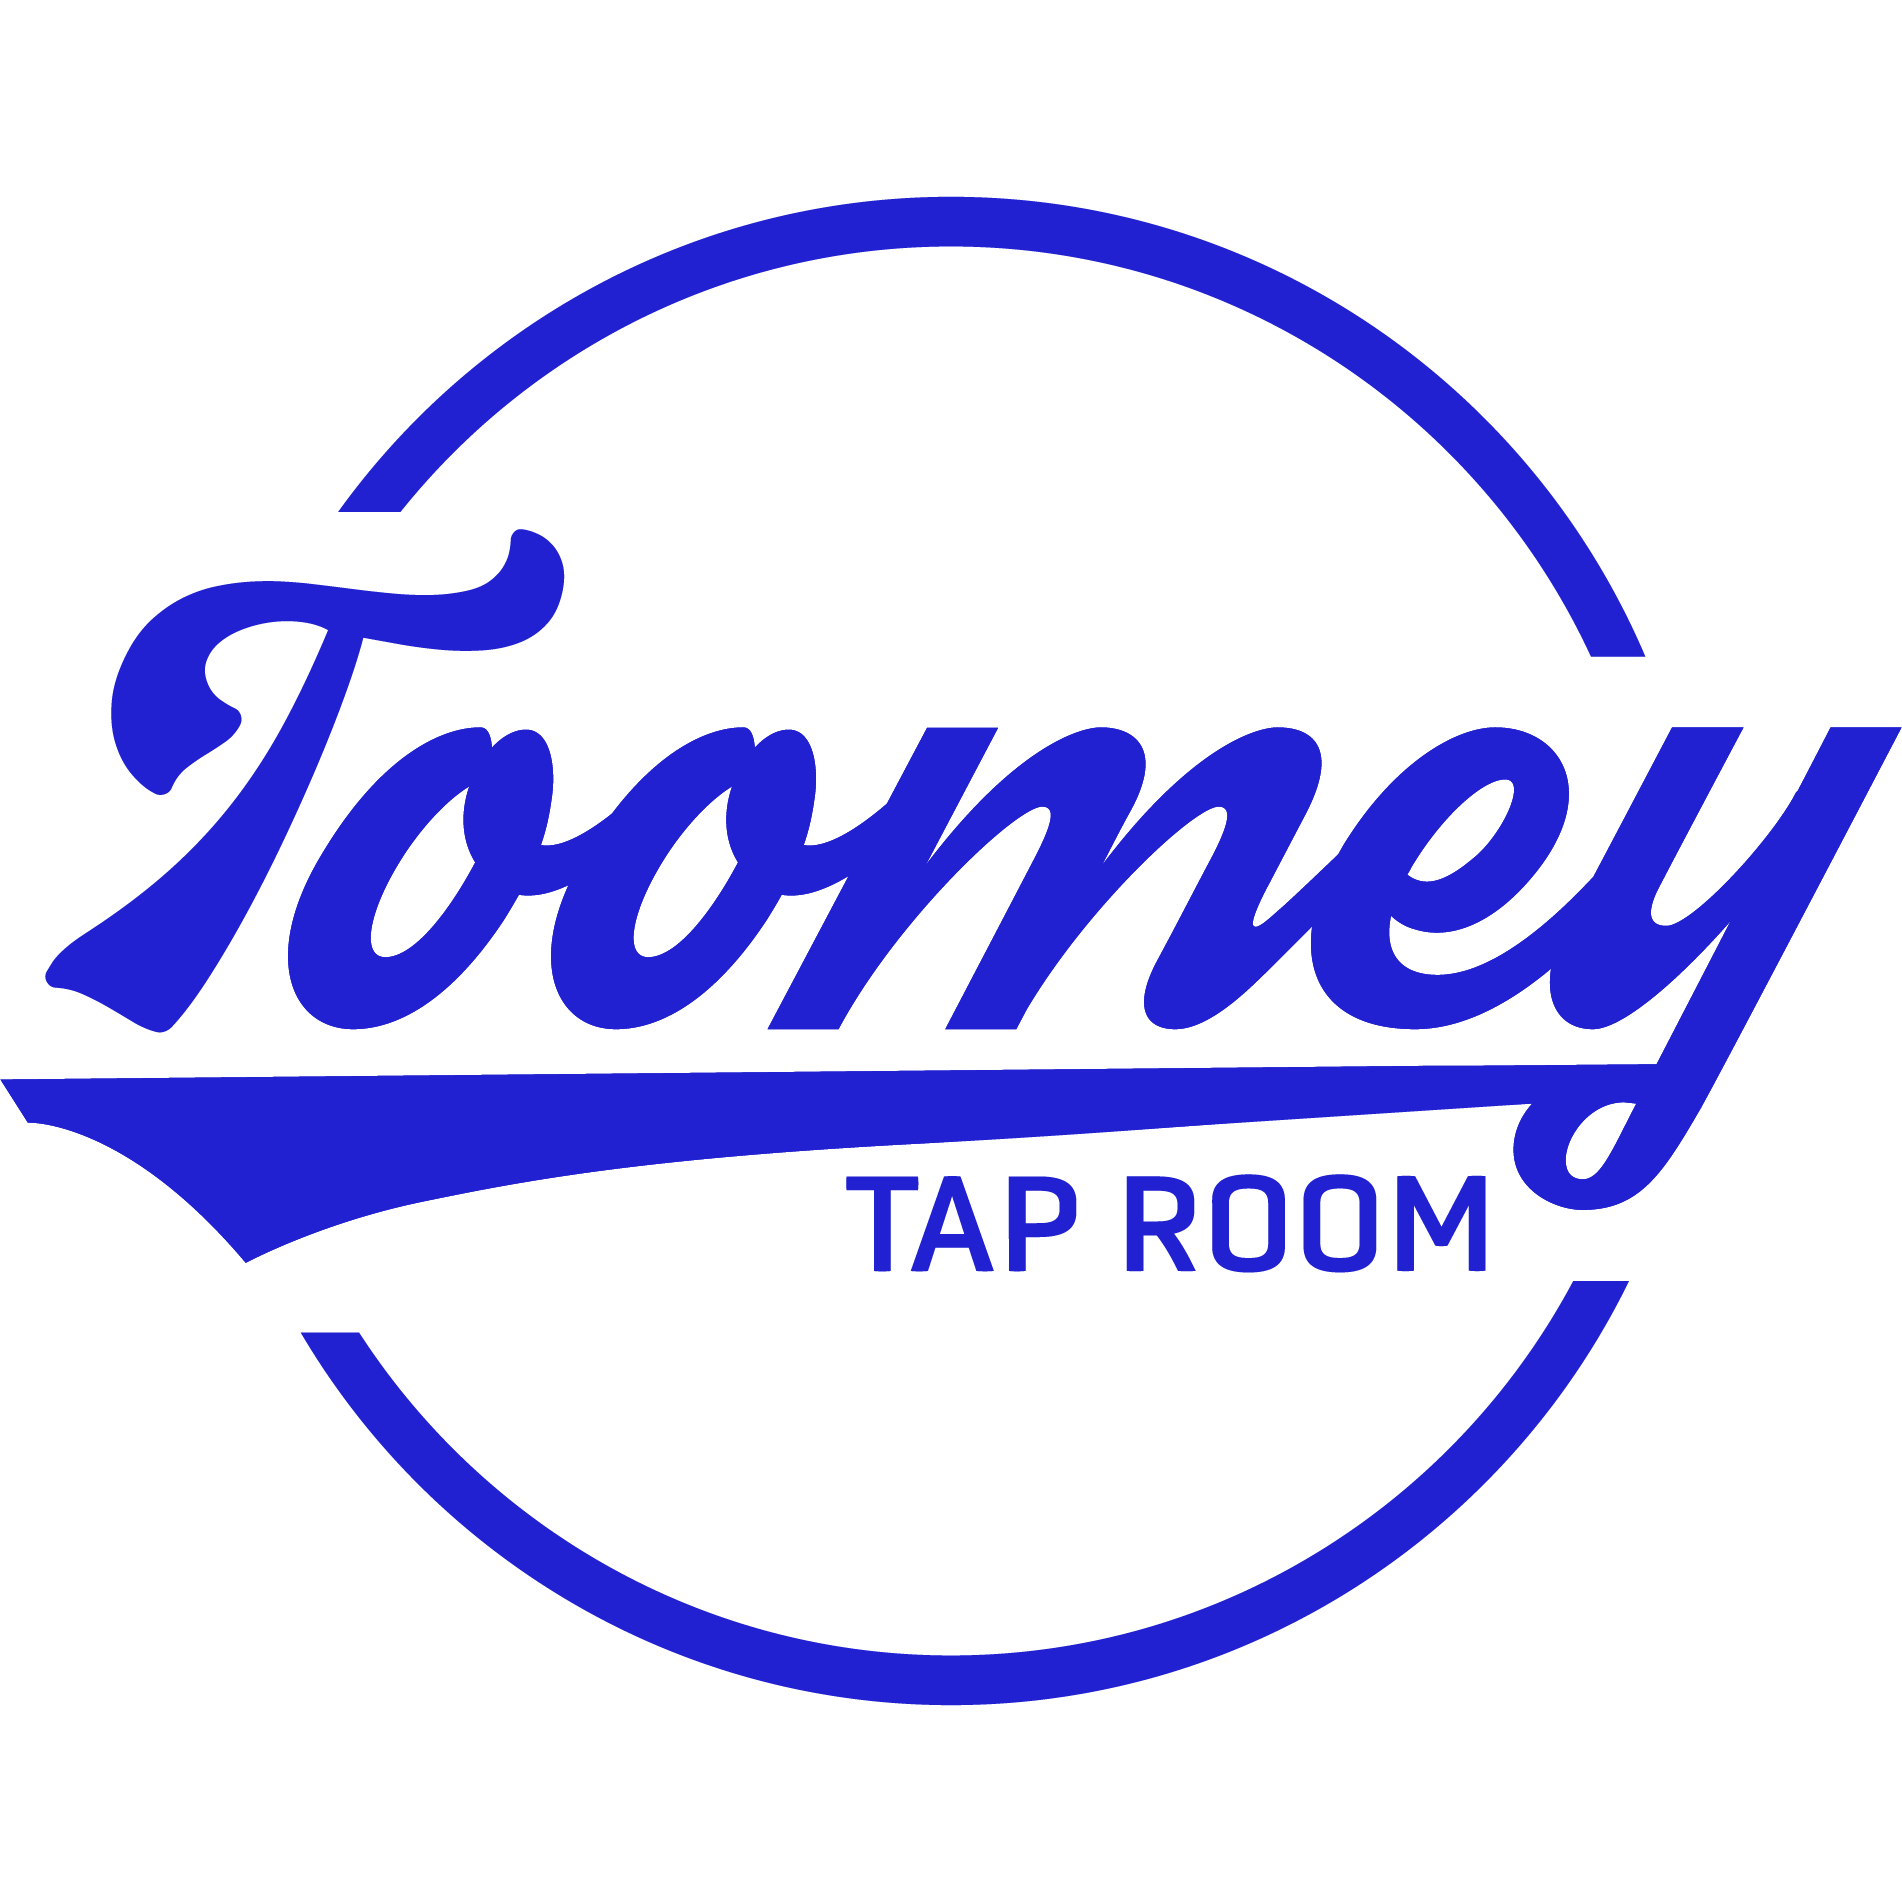 Toomey Tap Room